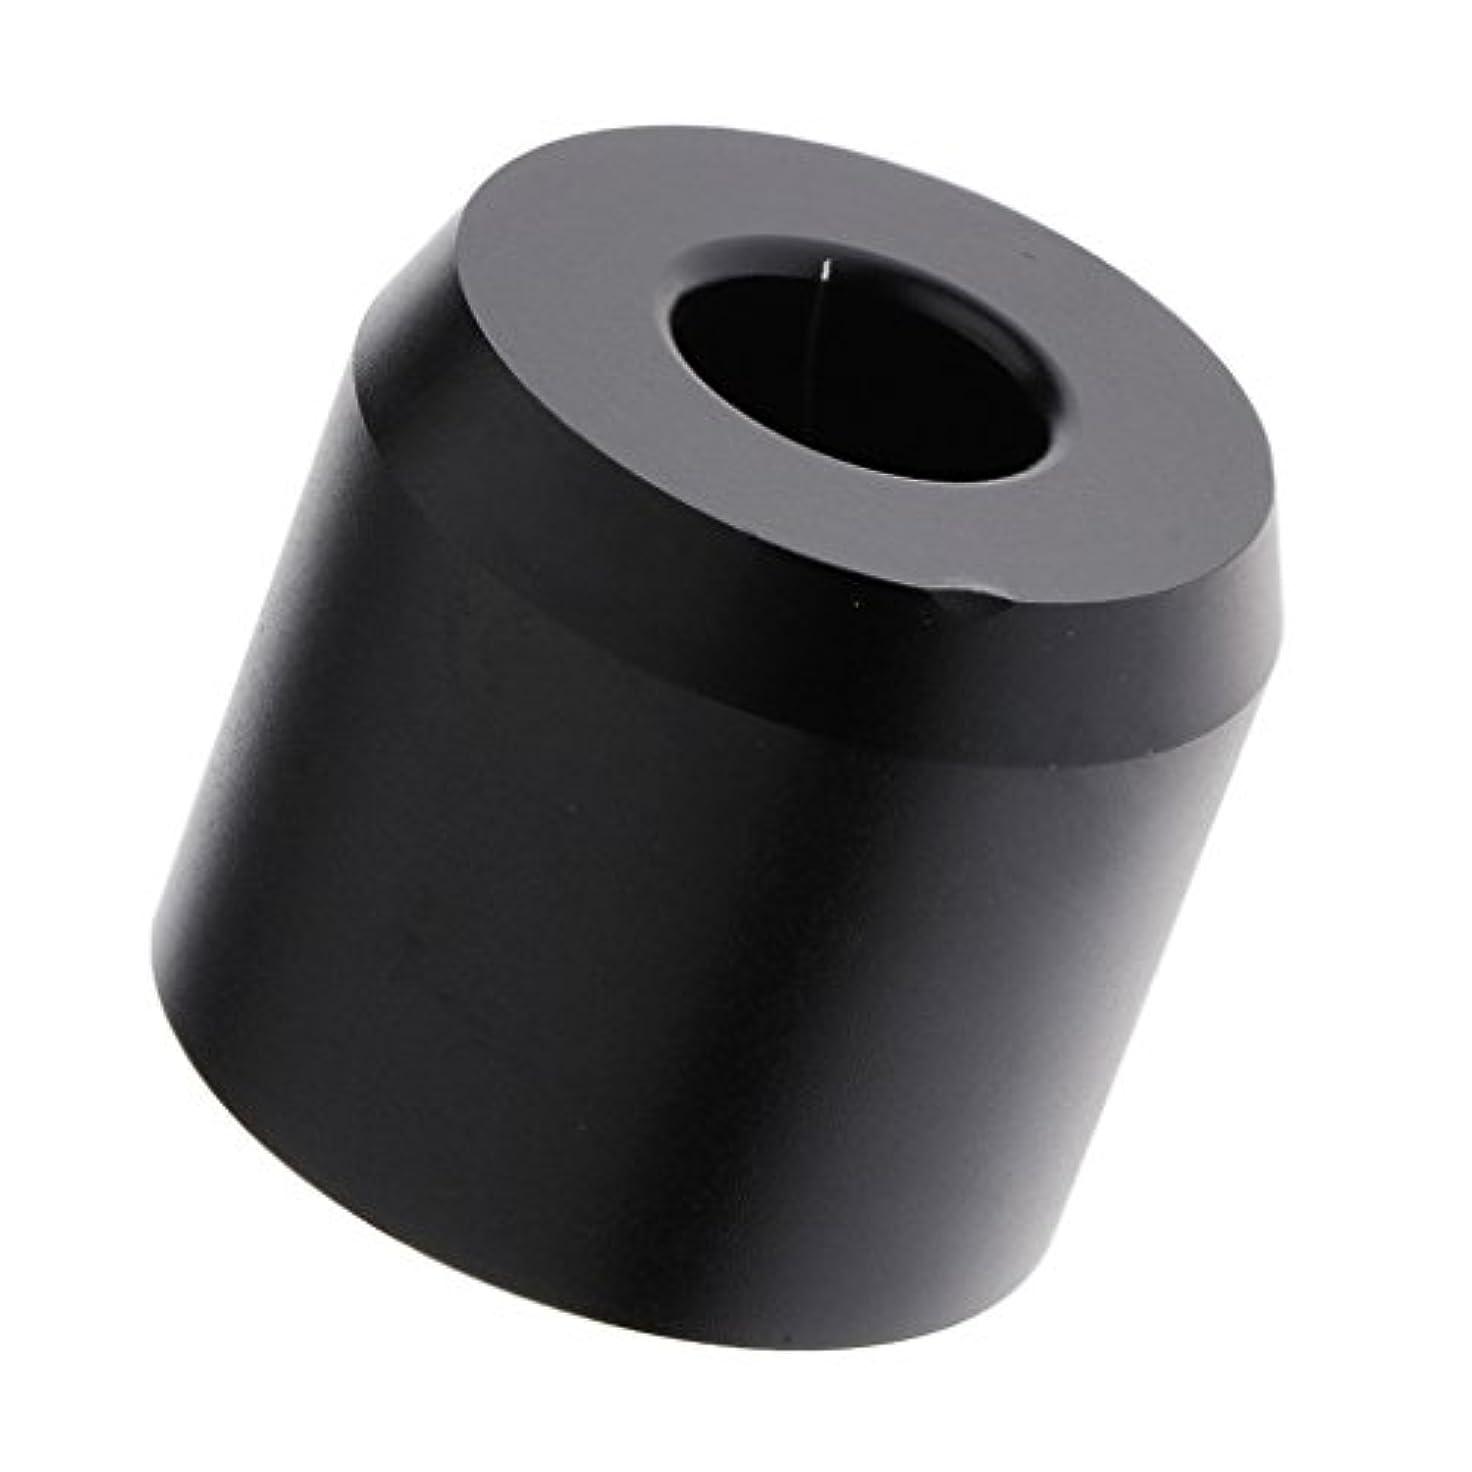 Perfk スタンドベース カミソリベース 髭剃りスタンド シェービングツール 収納ホルダー アルミ 耐久性 ミニサイズ 洗面所 場所節約 2色選べる - ブラック